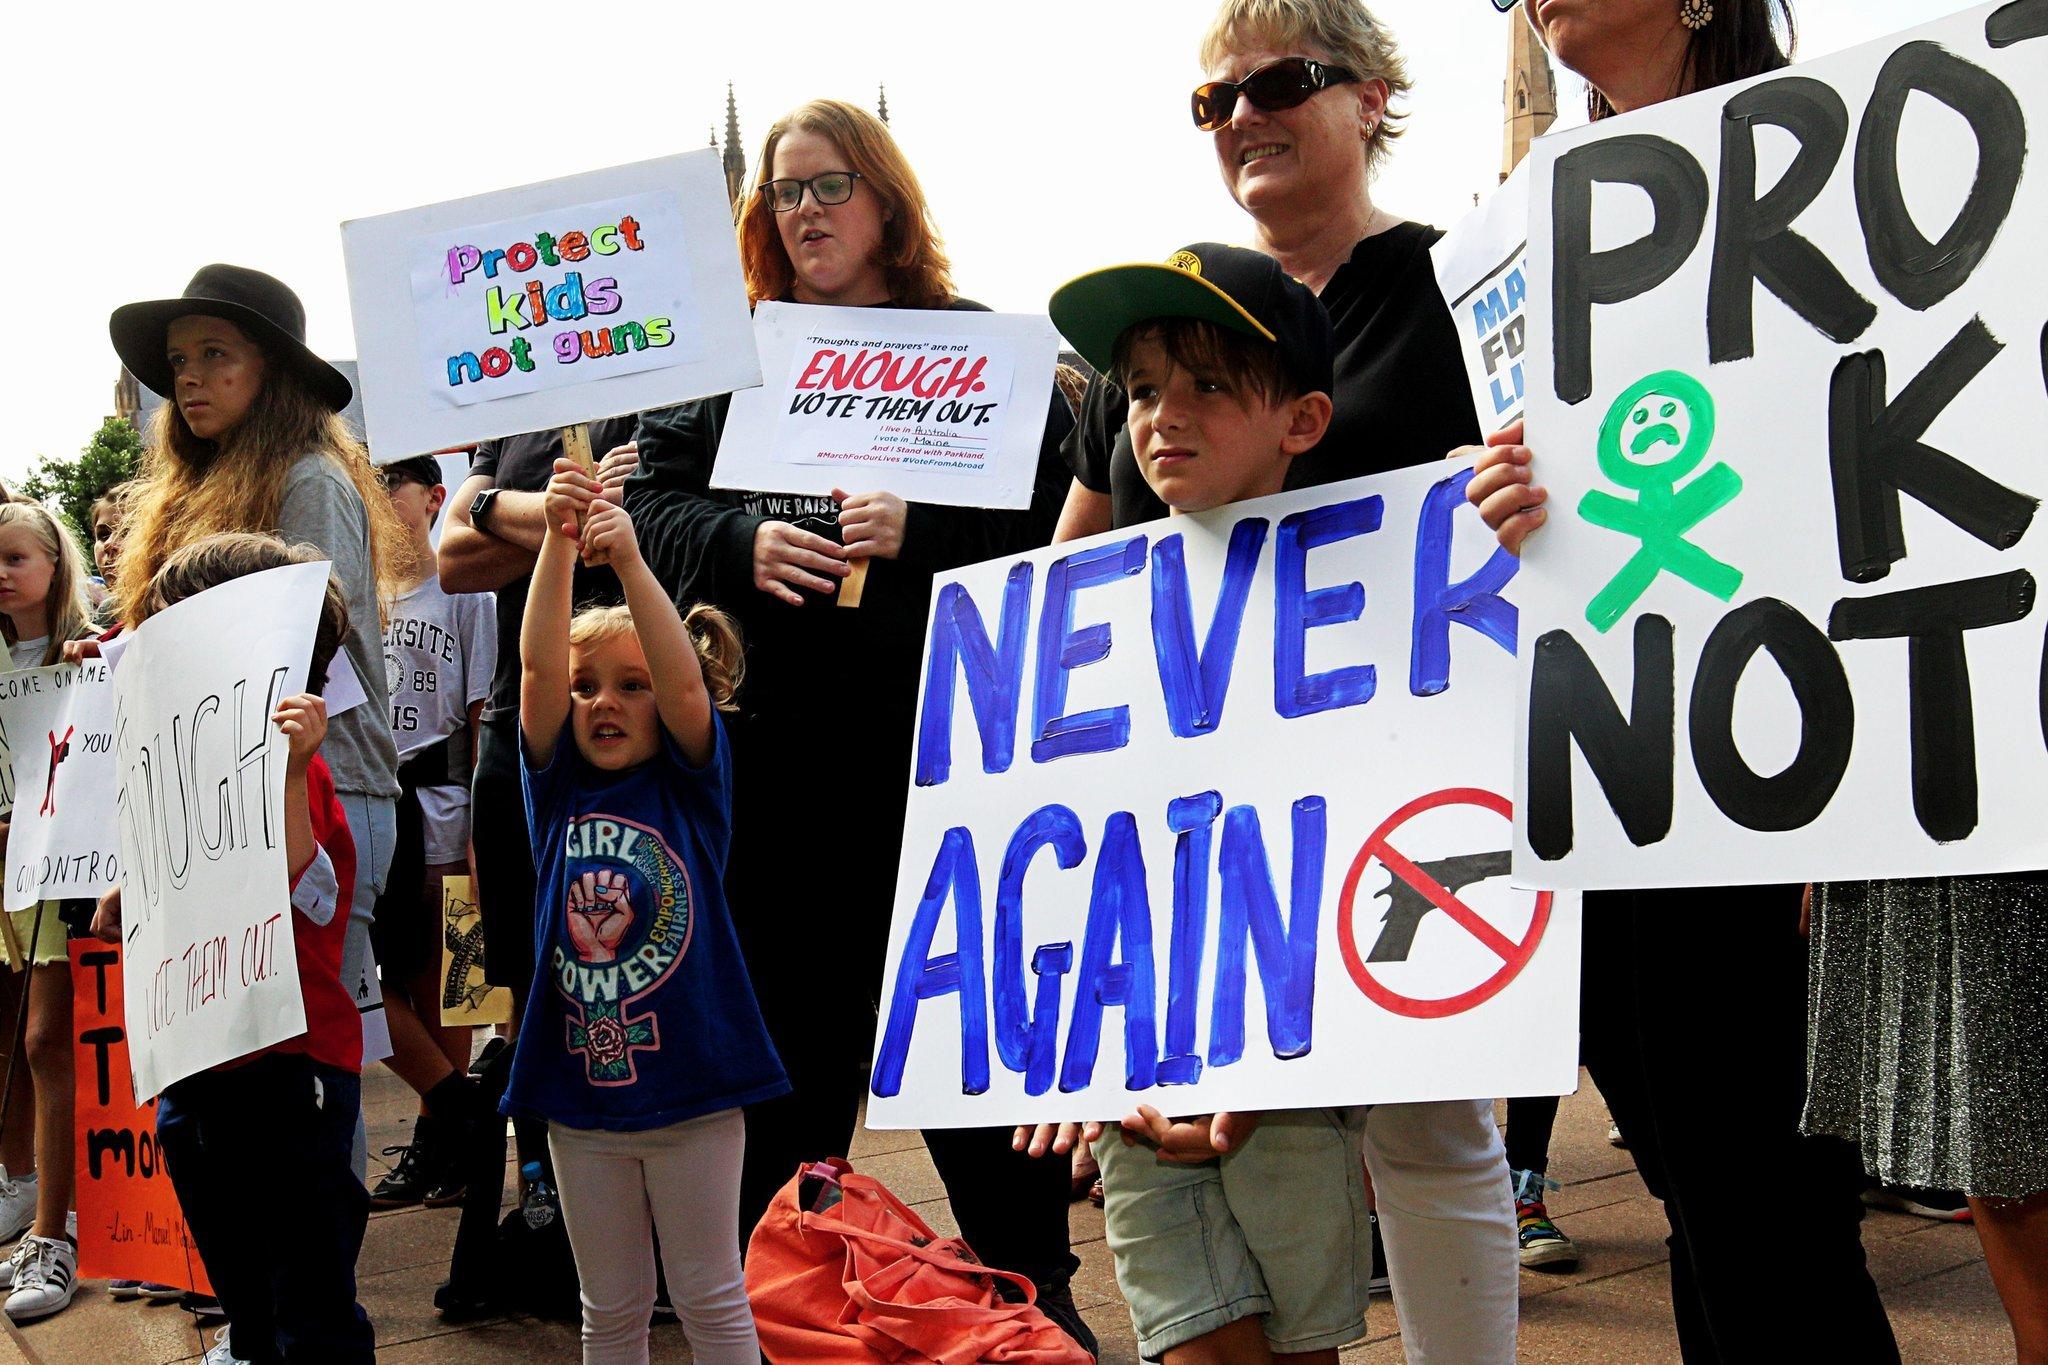 Protesters in Sydney, Australia, on Saturday. Photo by Danny Casey/EPA.